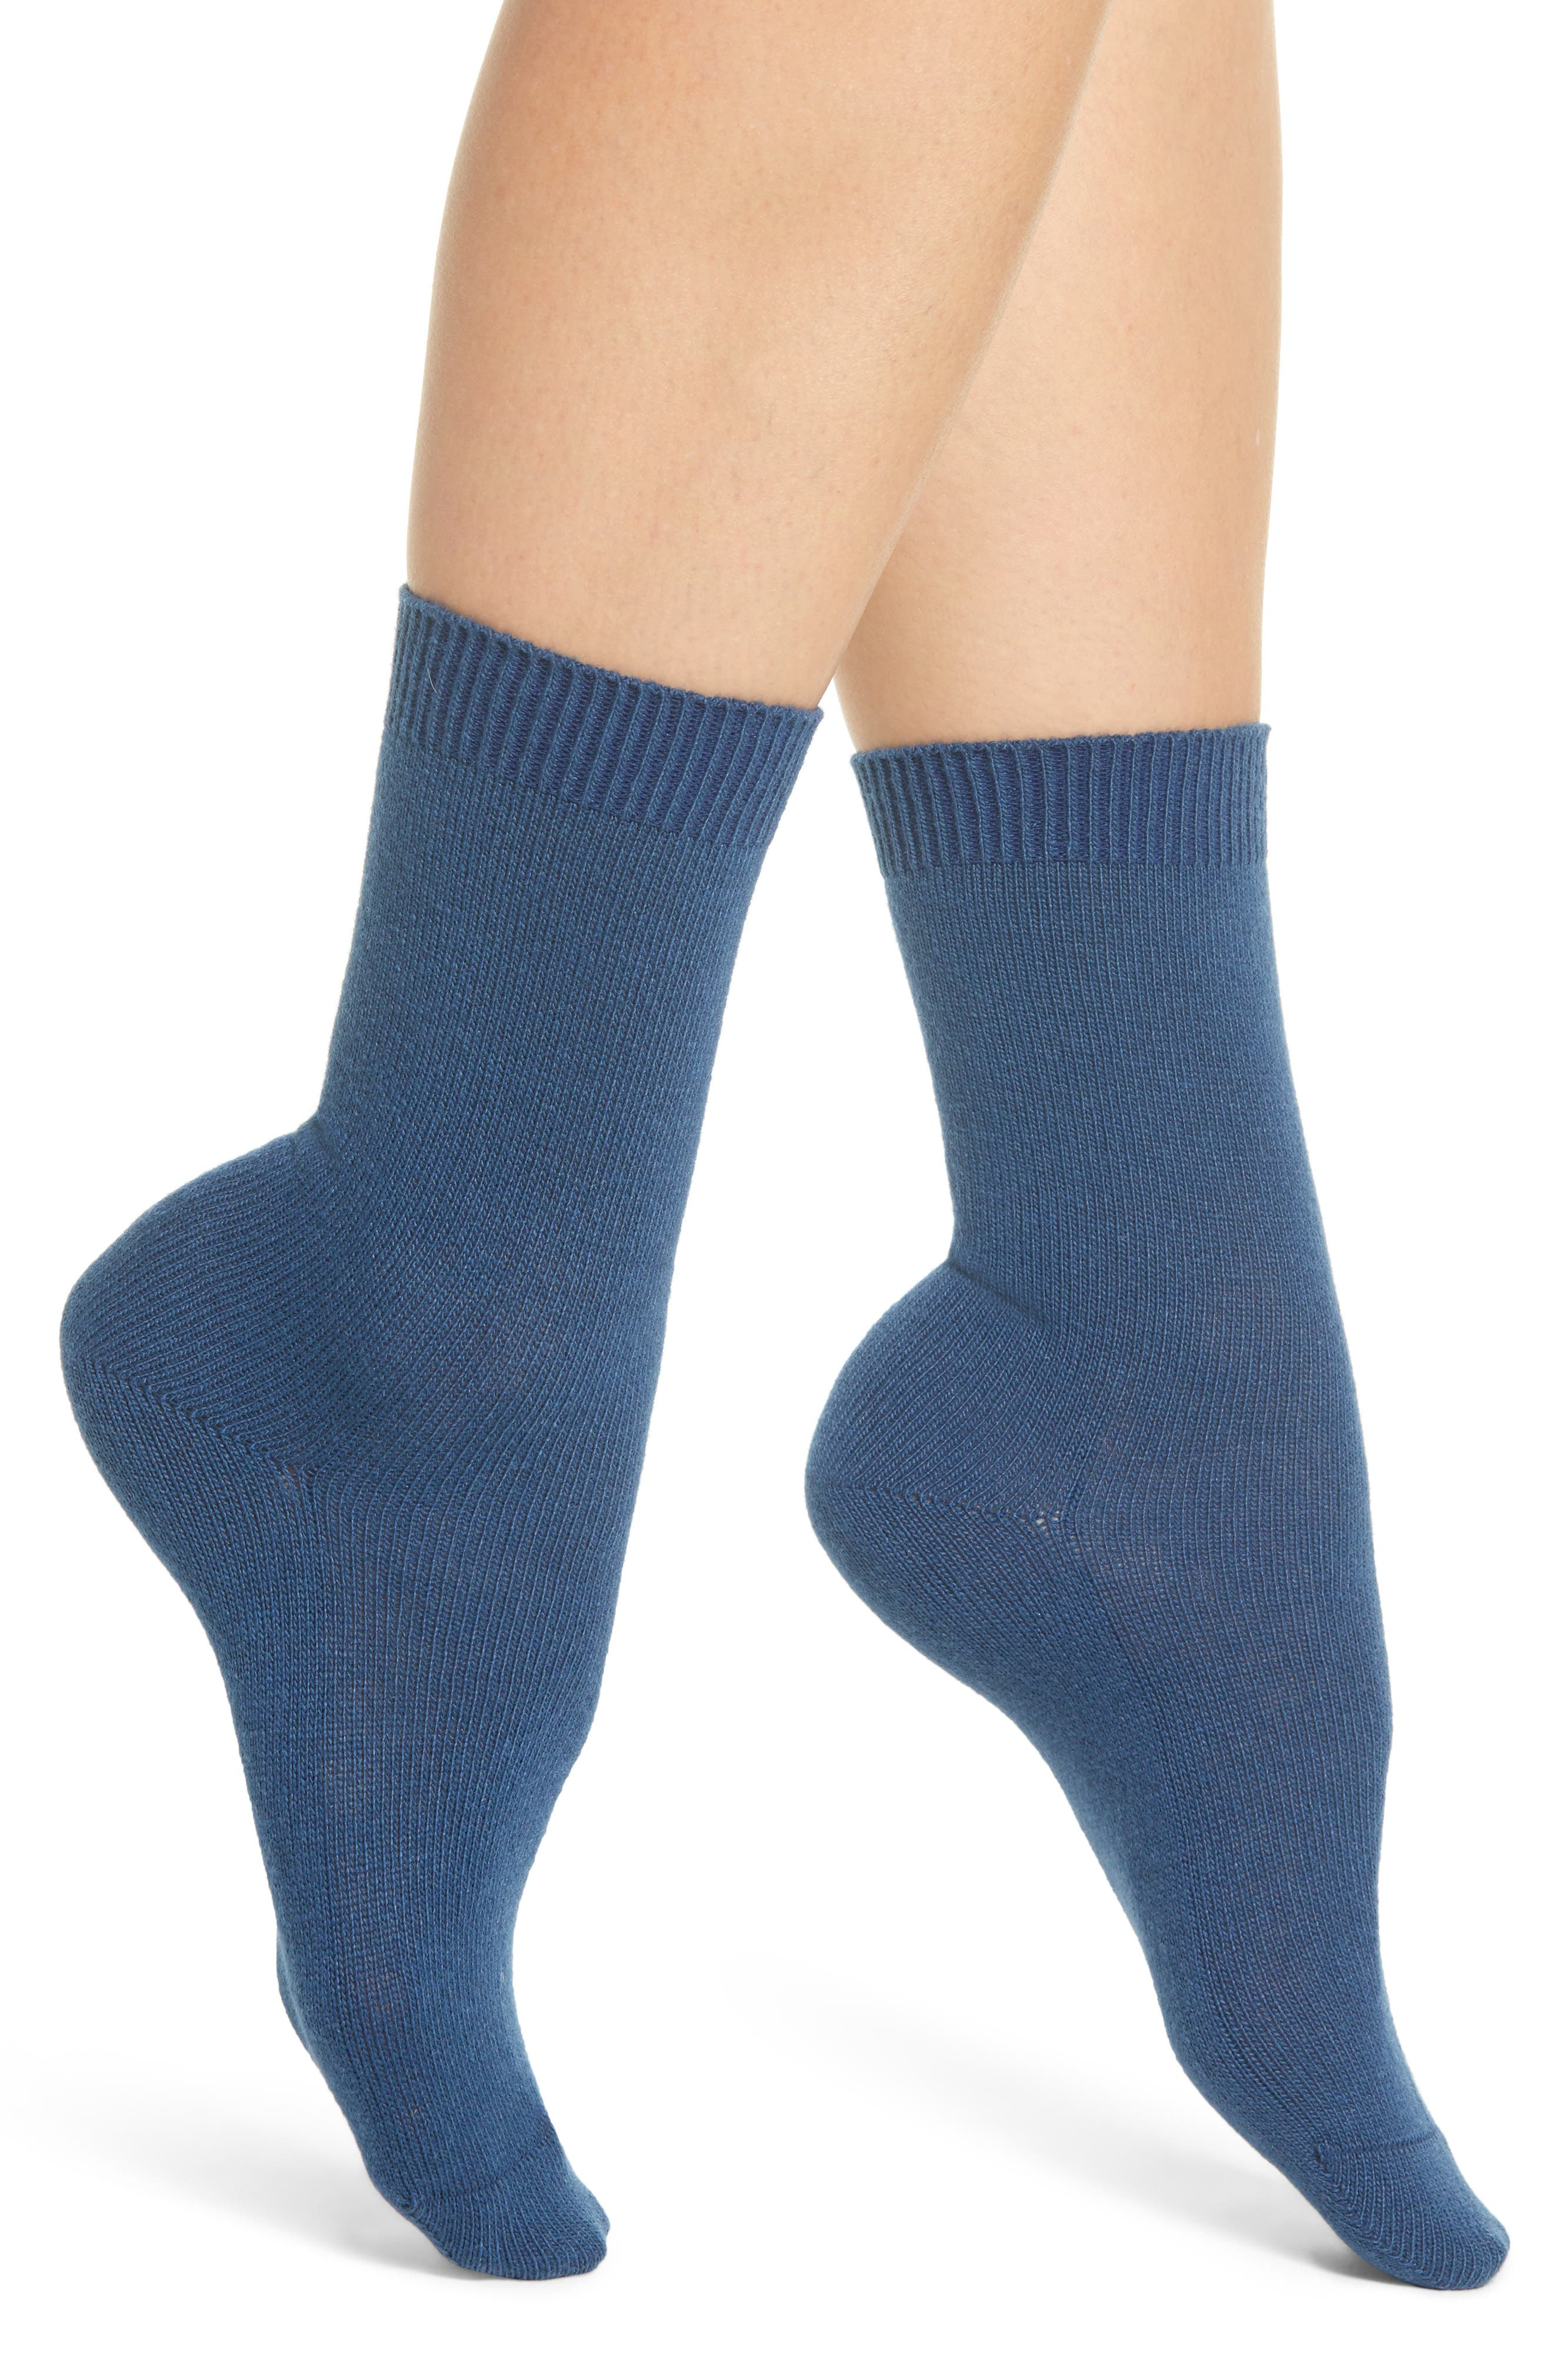 Cosy Crew Socks,                         Main,                         color, NIGHT SKY